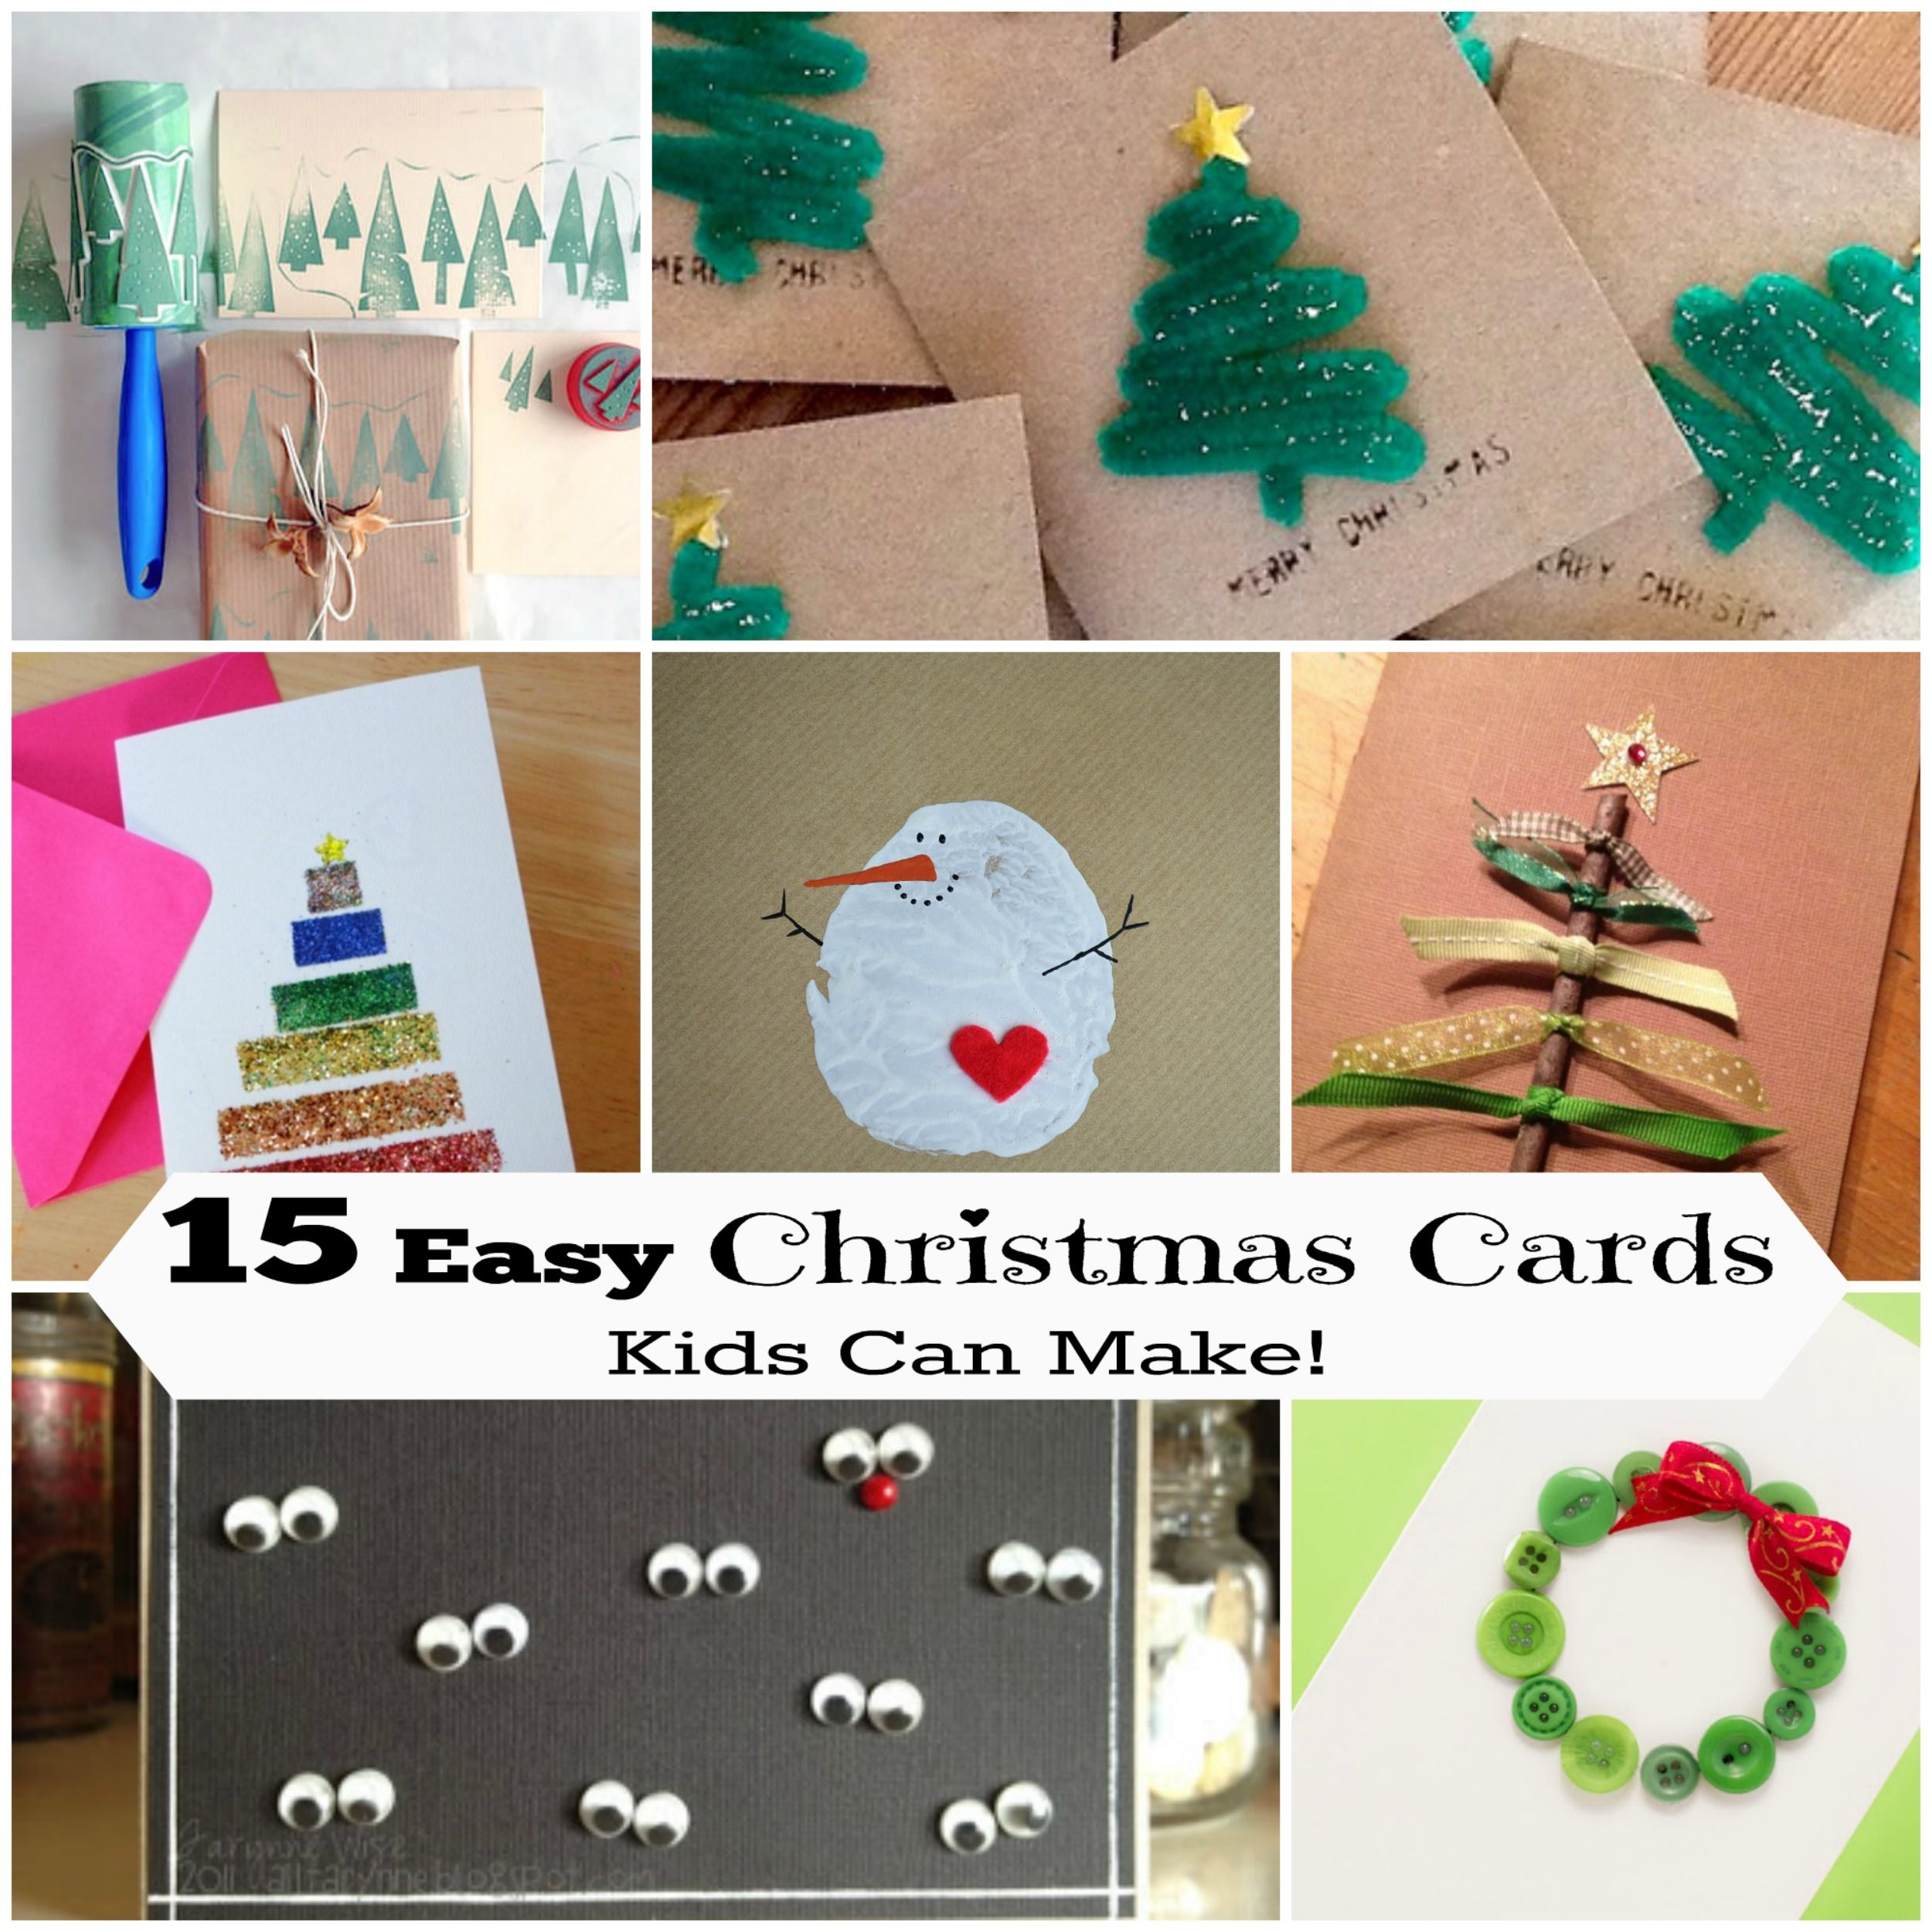 Homemade Christmas Card Ideas For Kids To Make Part - 42: 15 DIY Christmas Cards Kids Can Make